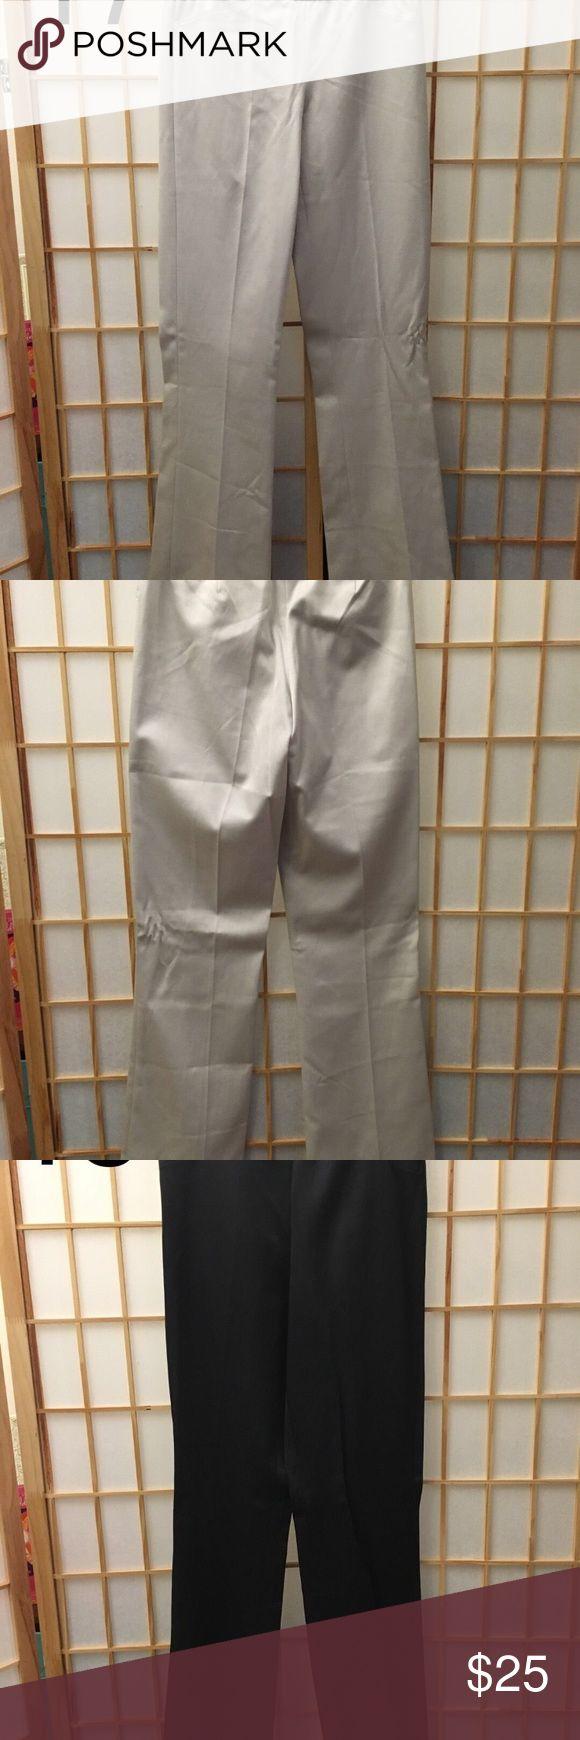 New size 4 Spiegel Olivia Skinny pull on pant New size 4 Spiegel Olivia Skinny pull on pant Spiegel Pants Skinny